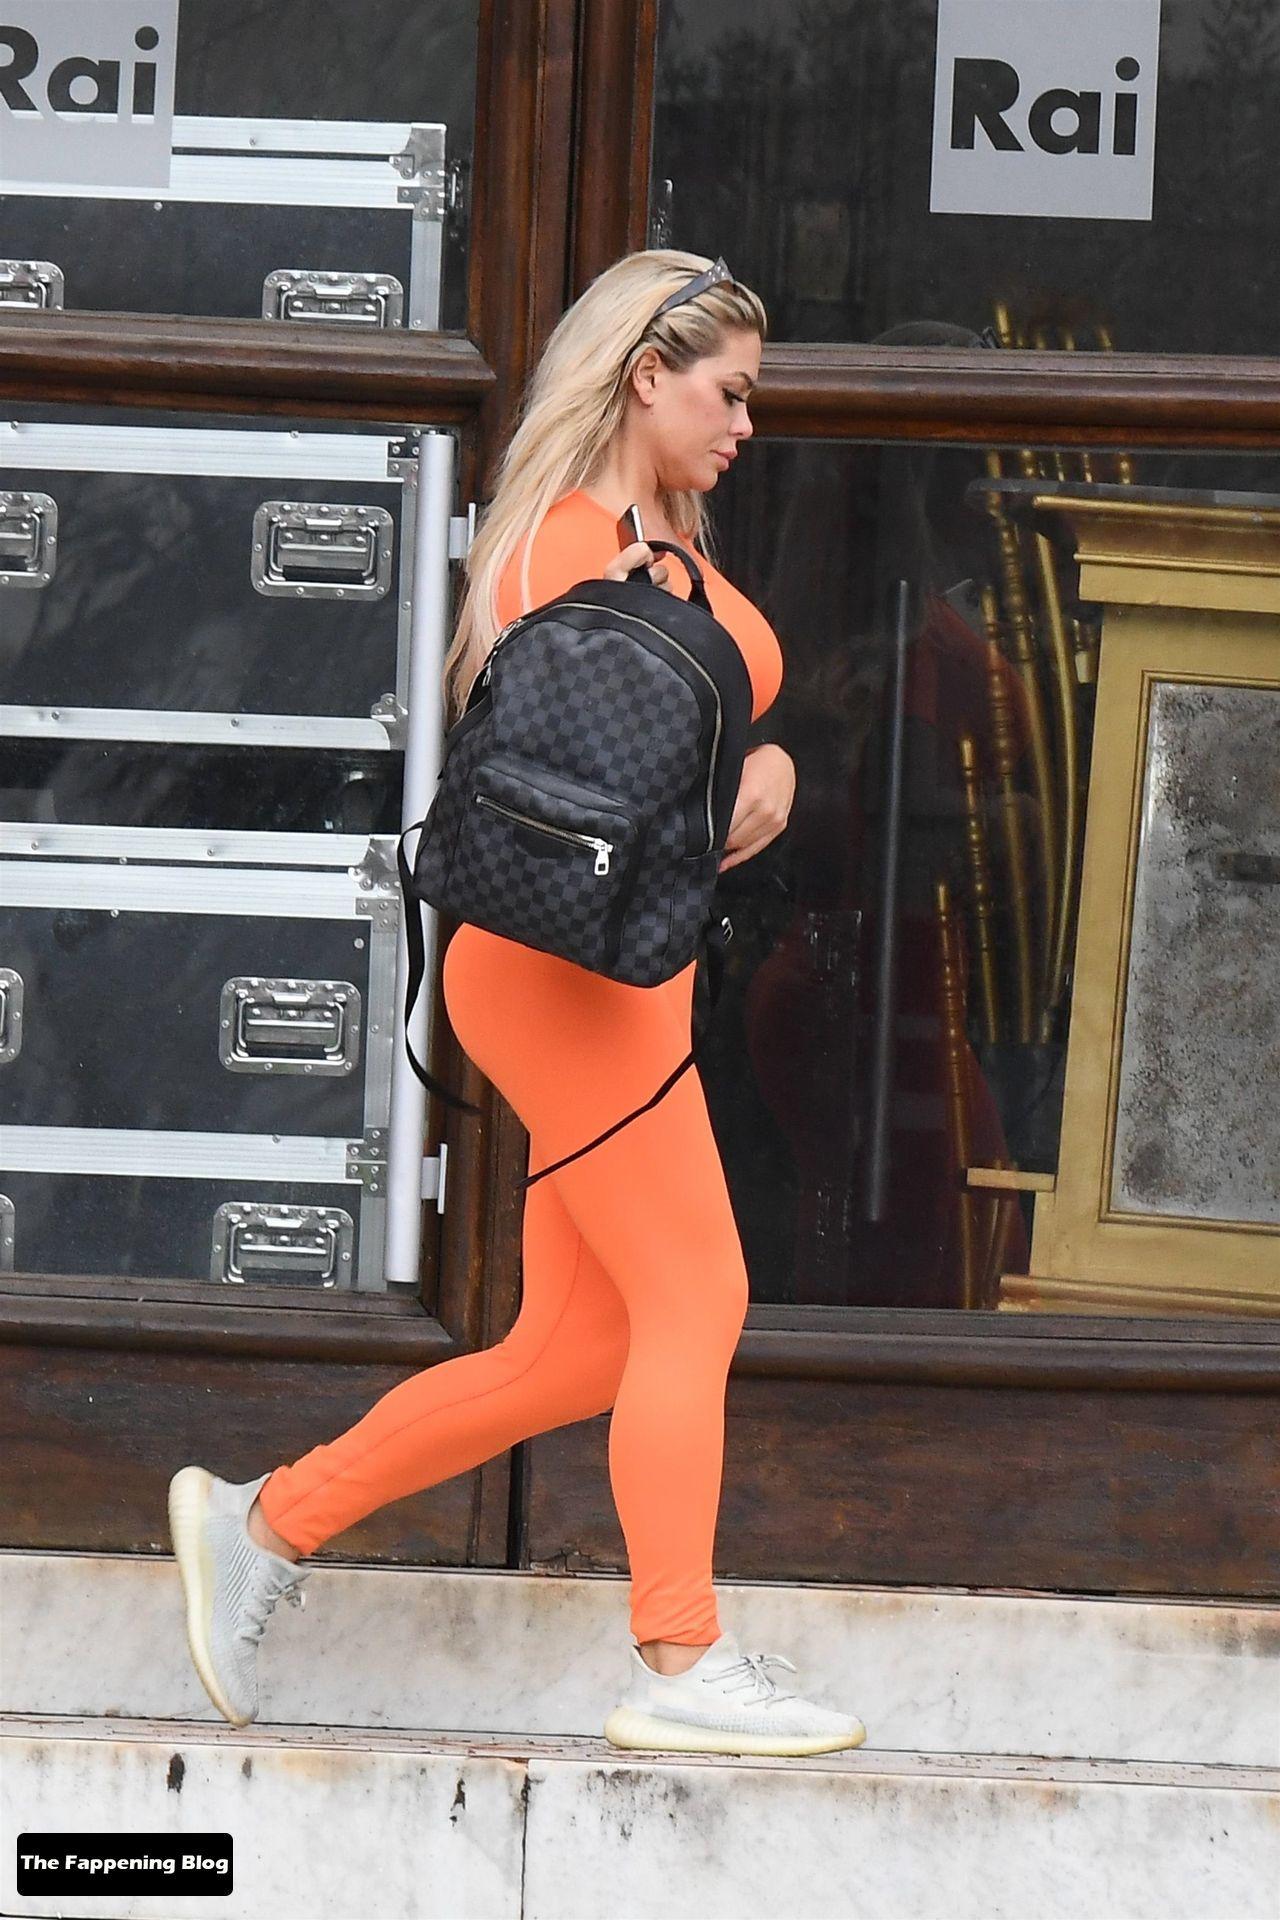 Bianca-Gascoigne-Sexy-The-Fappening-Blog-3.jpg